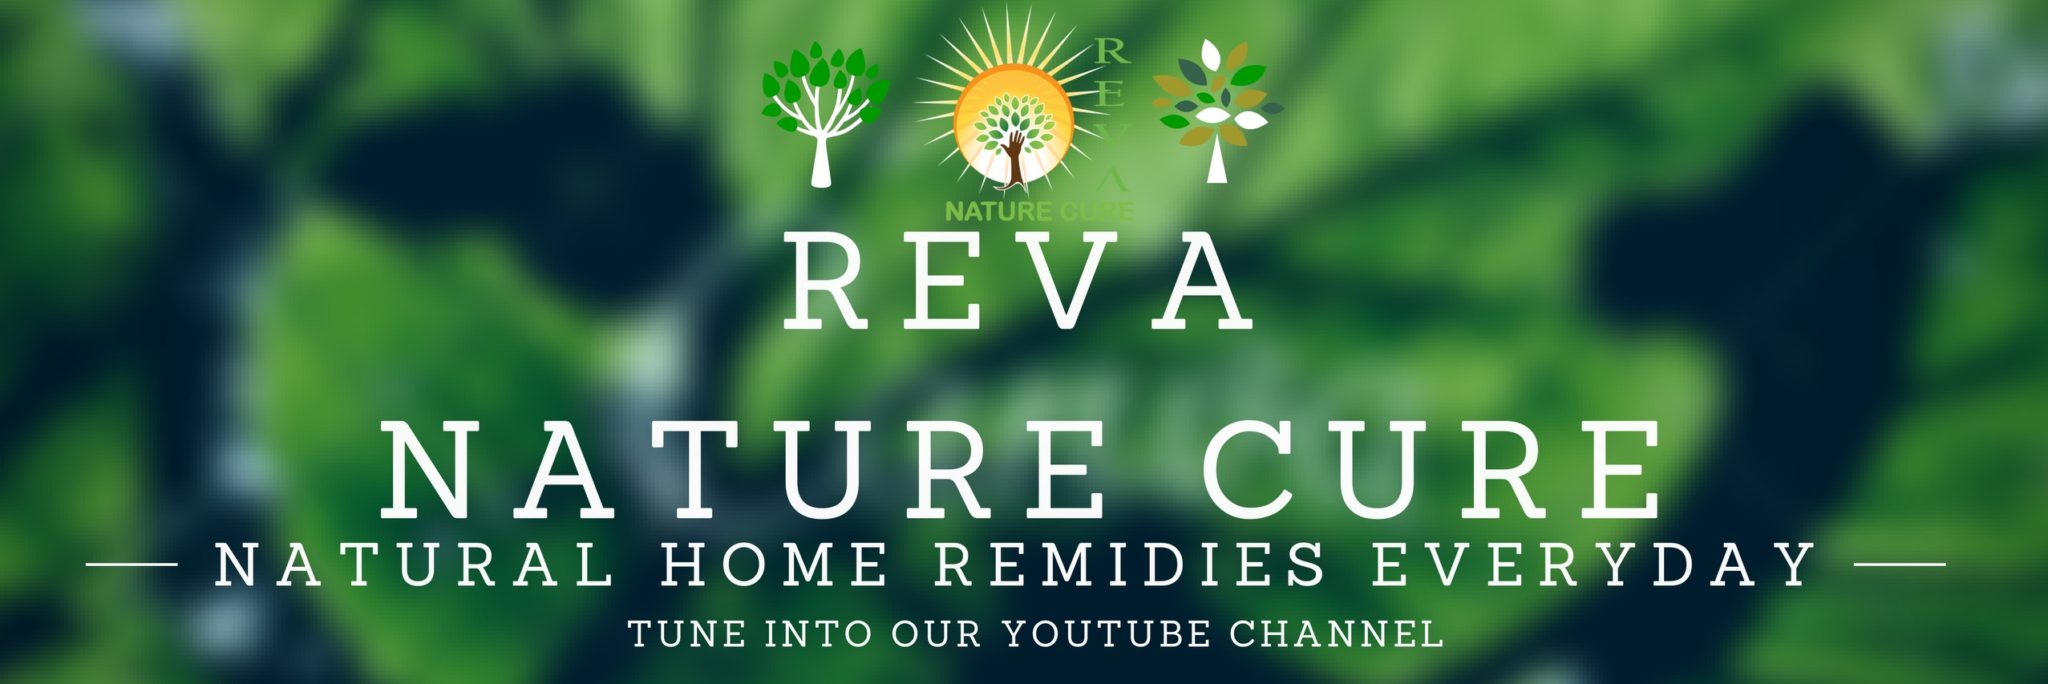 Reva Nature Cure Vadodara Gujarat